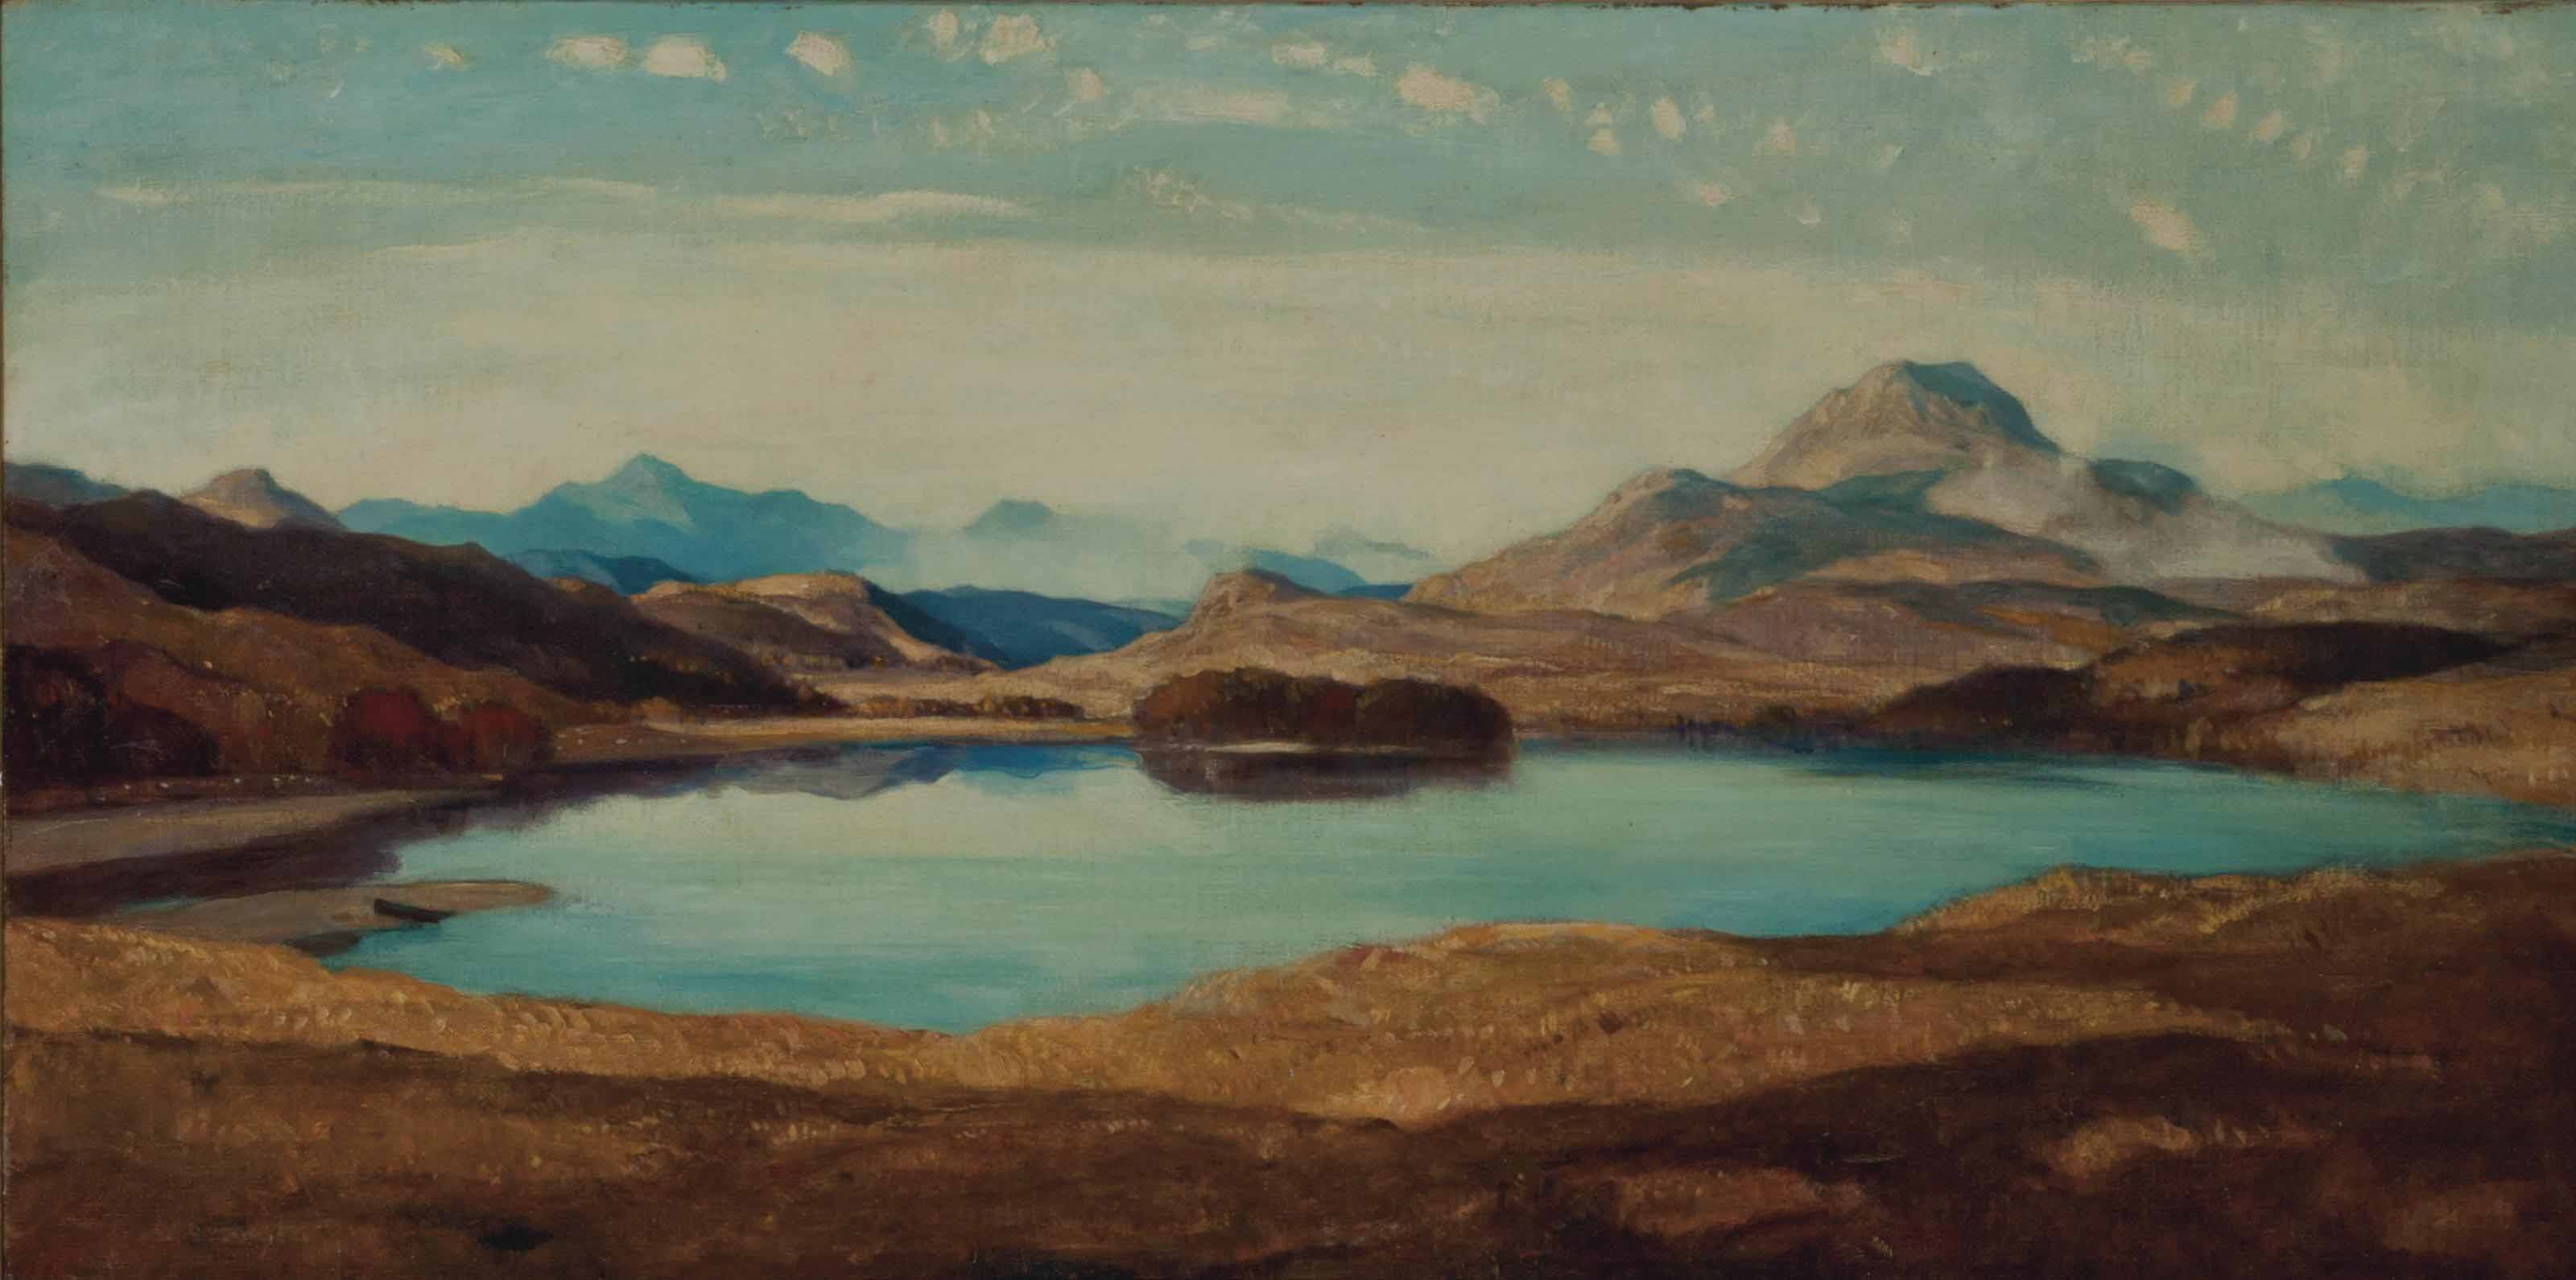 The Eternal Hills, Loch Tarff